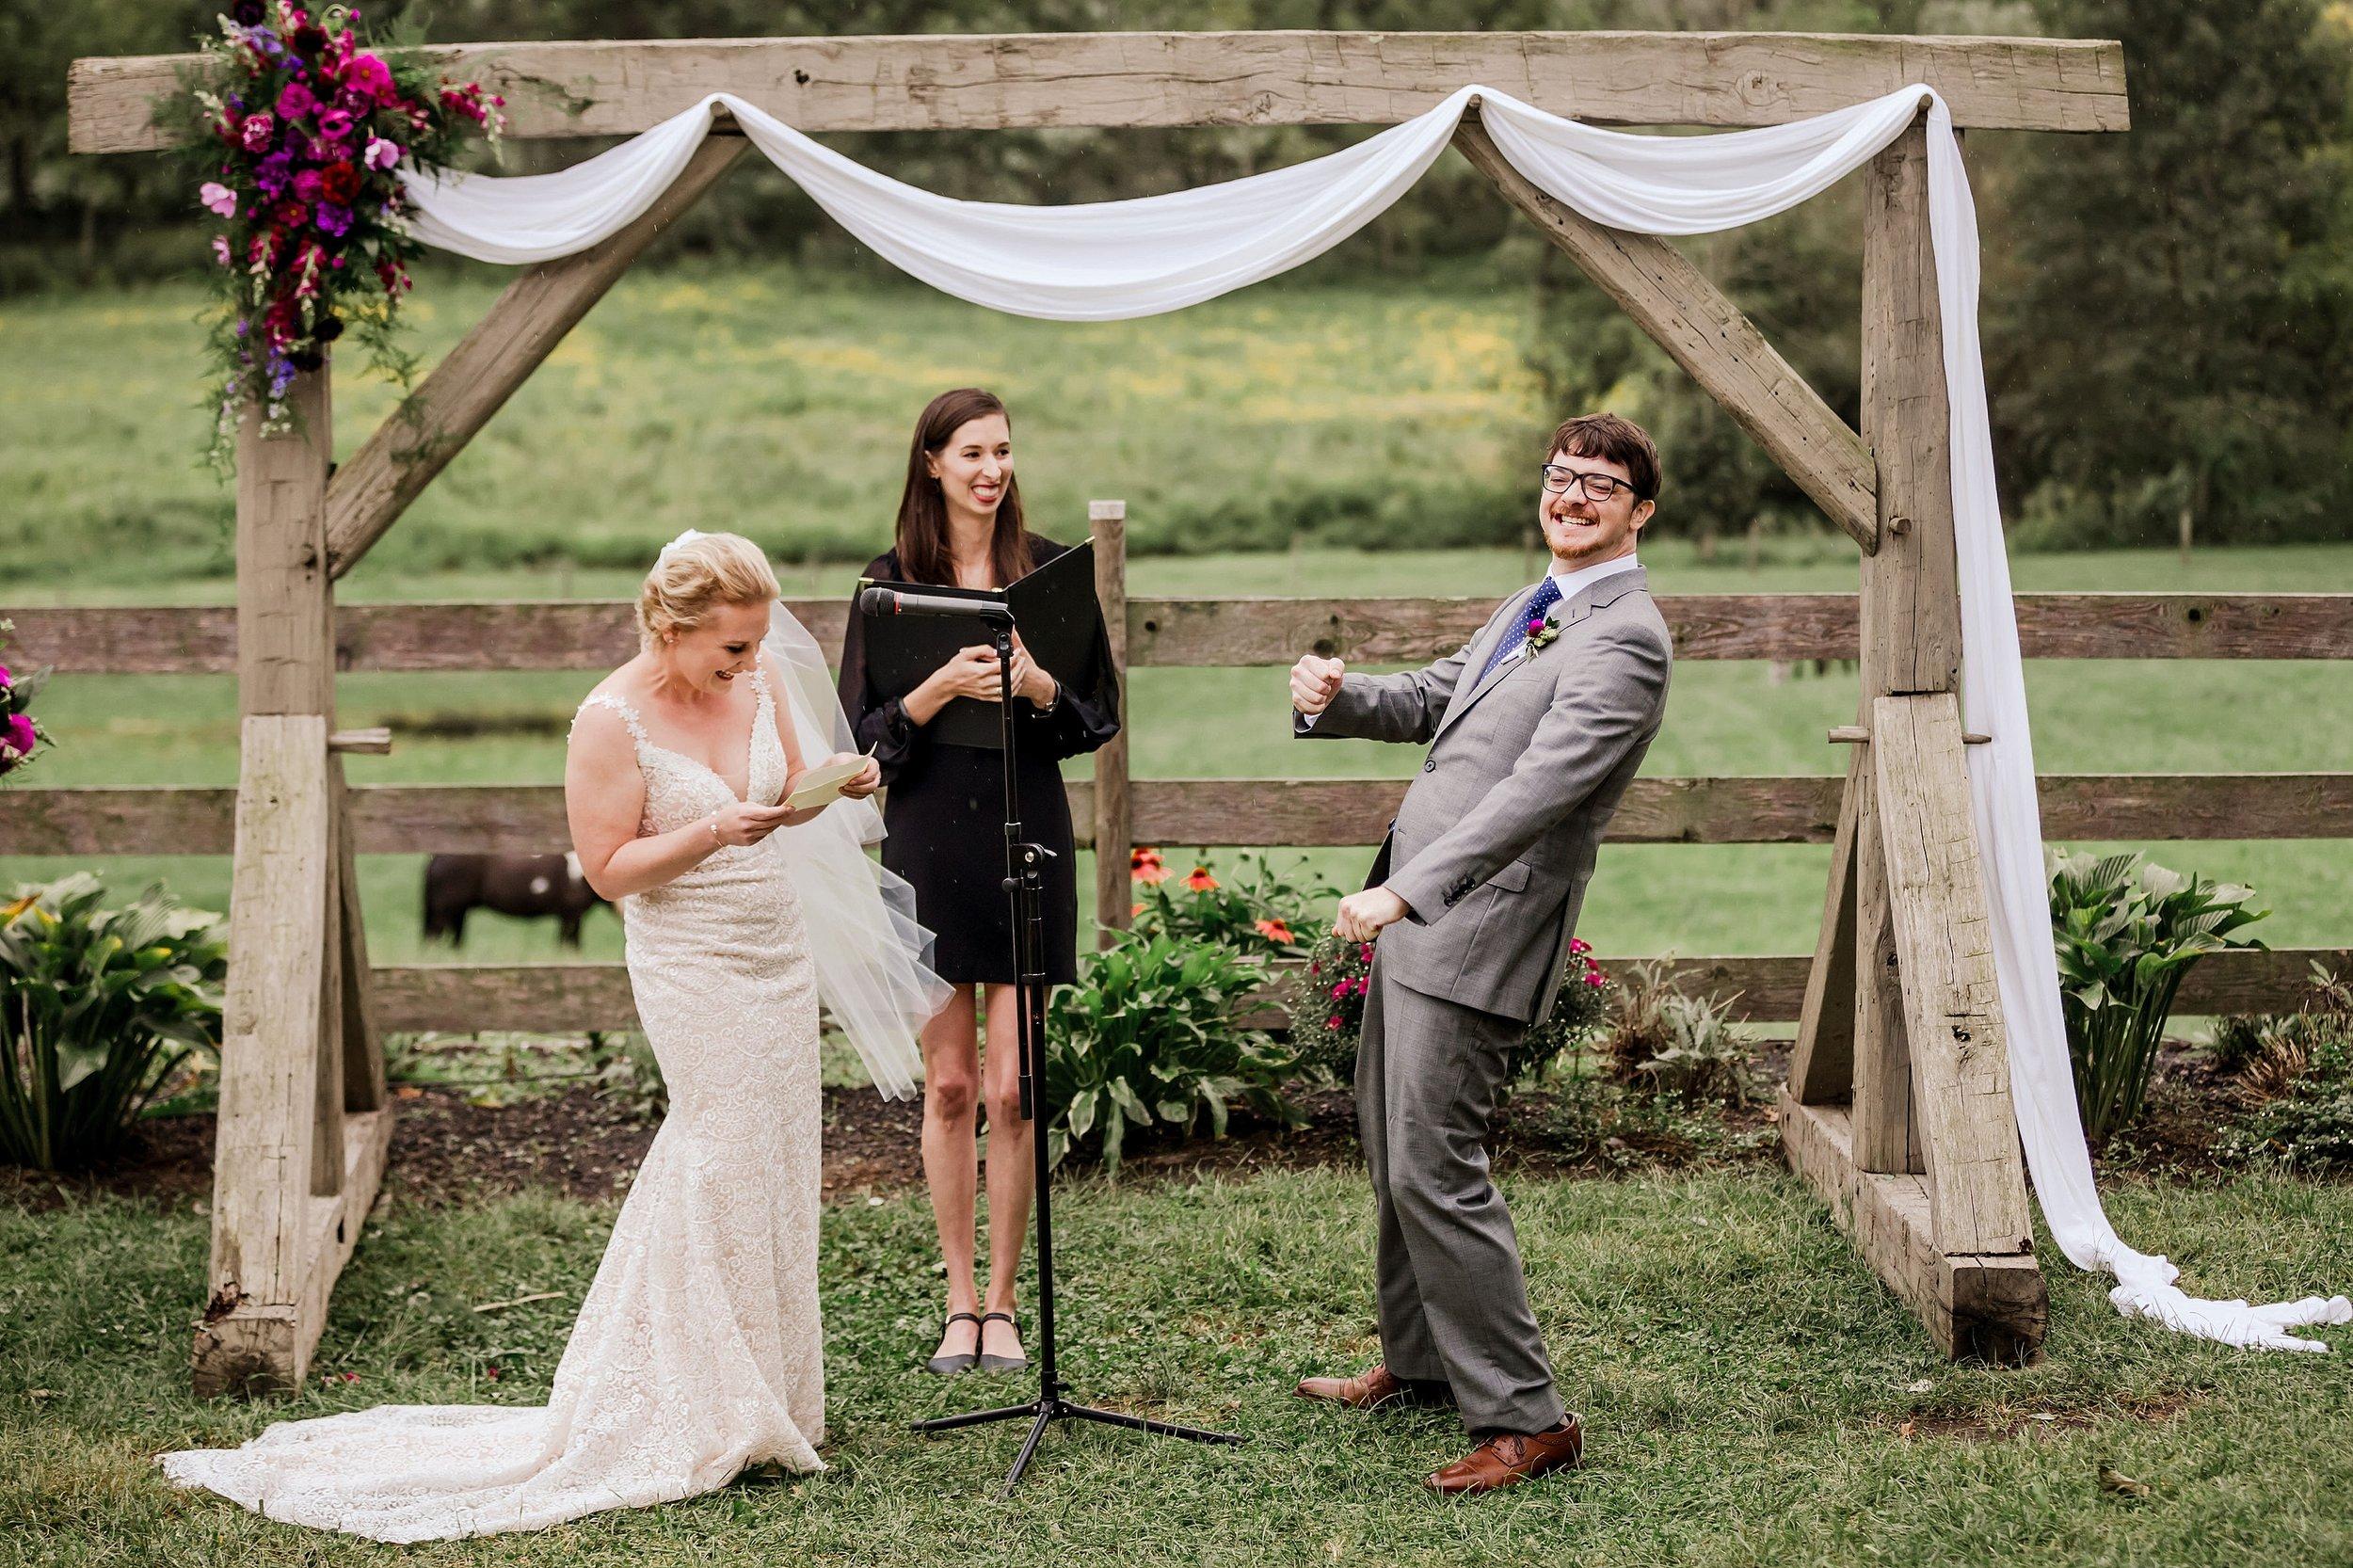 Durham-Hill-Farm-Wedding-Photographer_0005.jpg